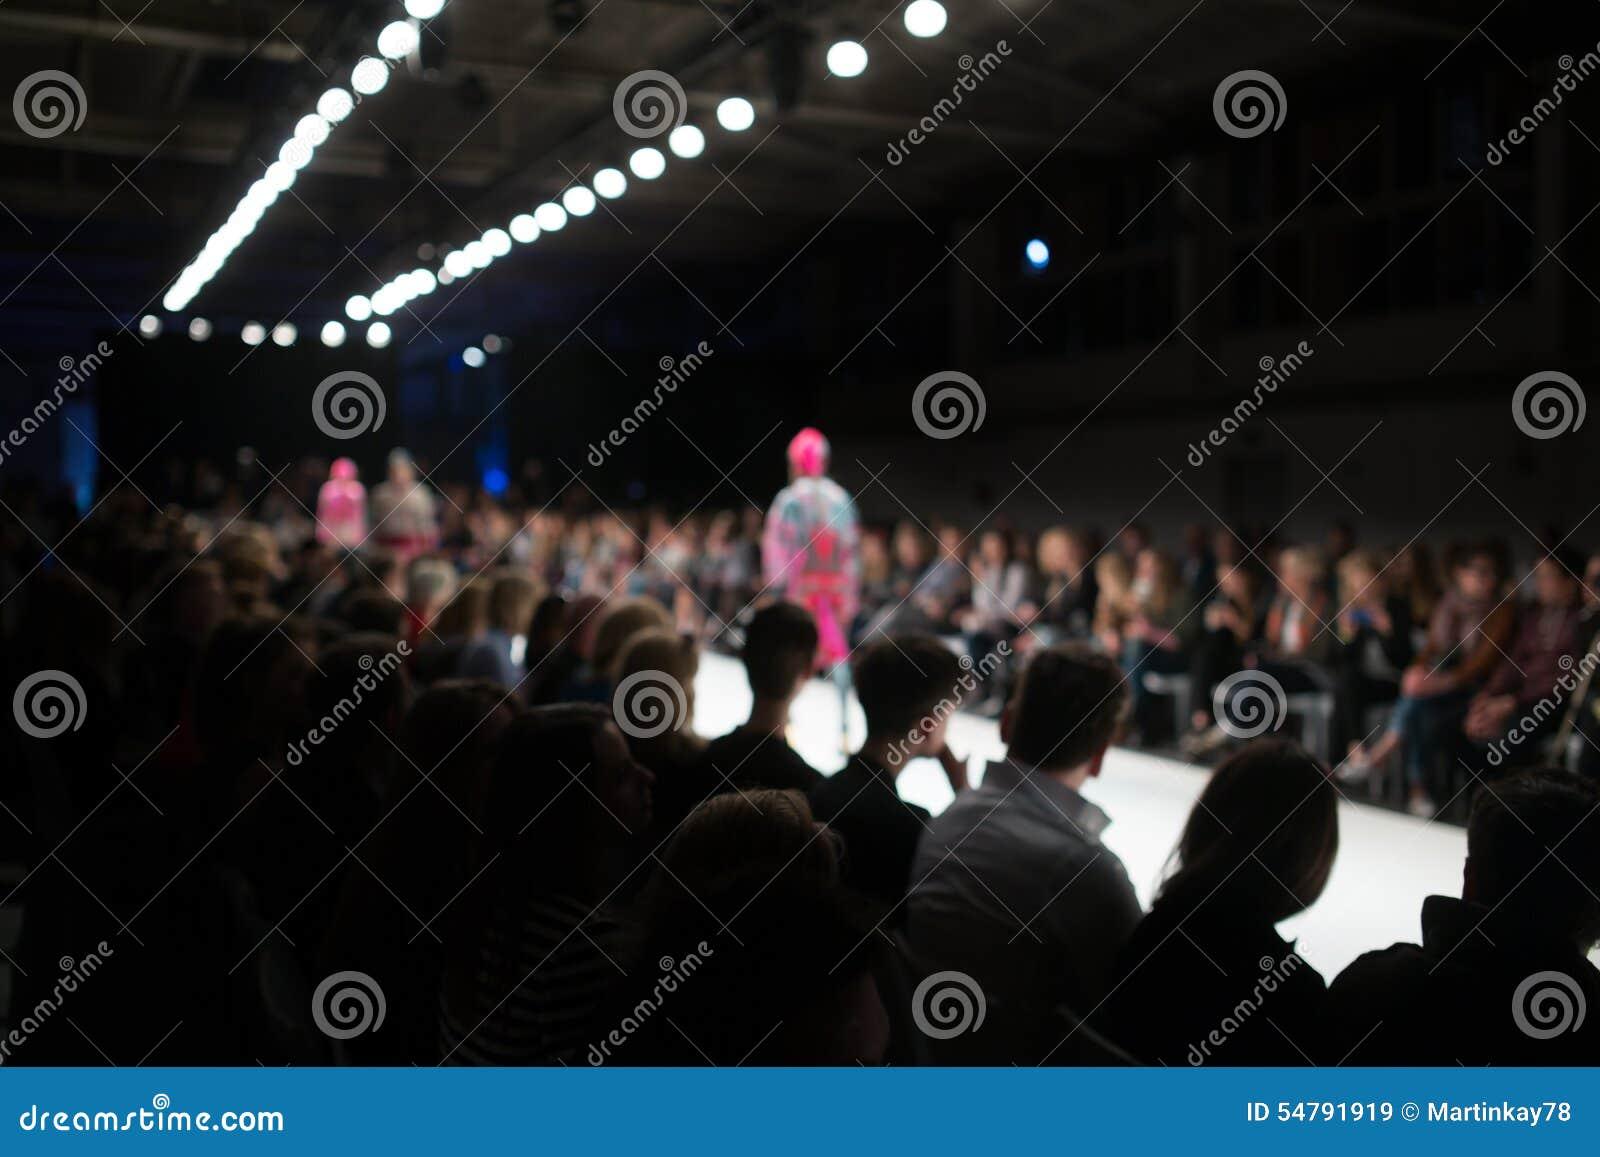 Fashion Show Stock Photo Image 54791919